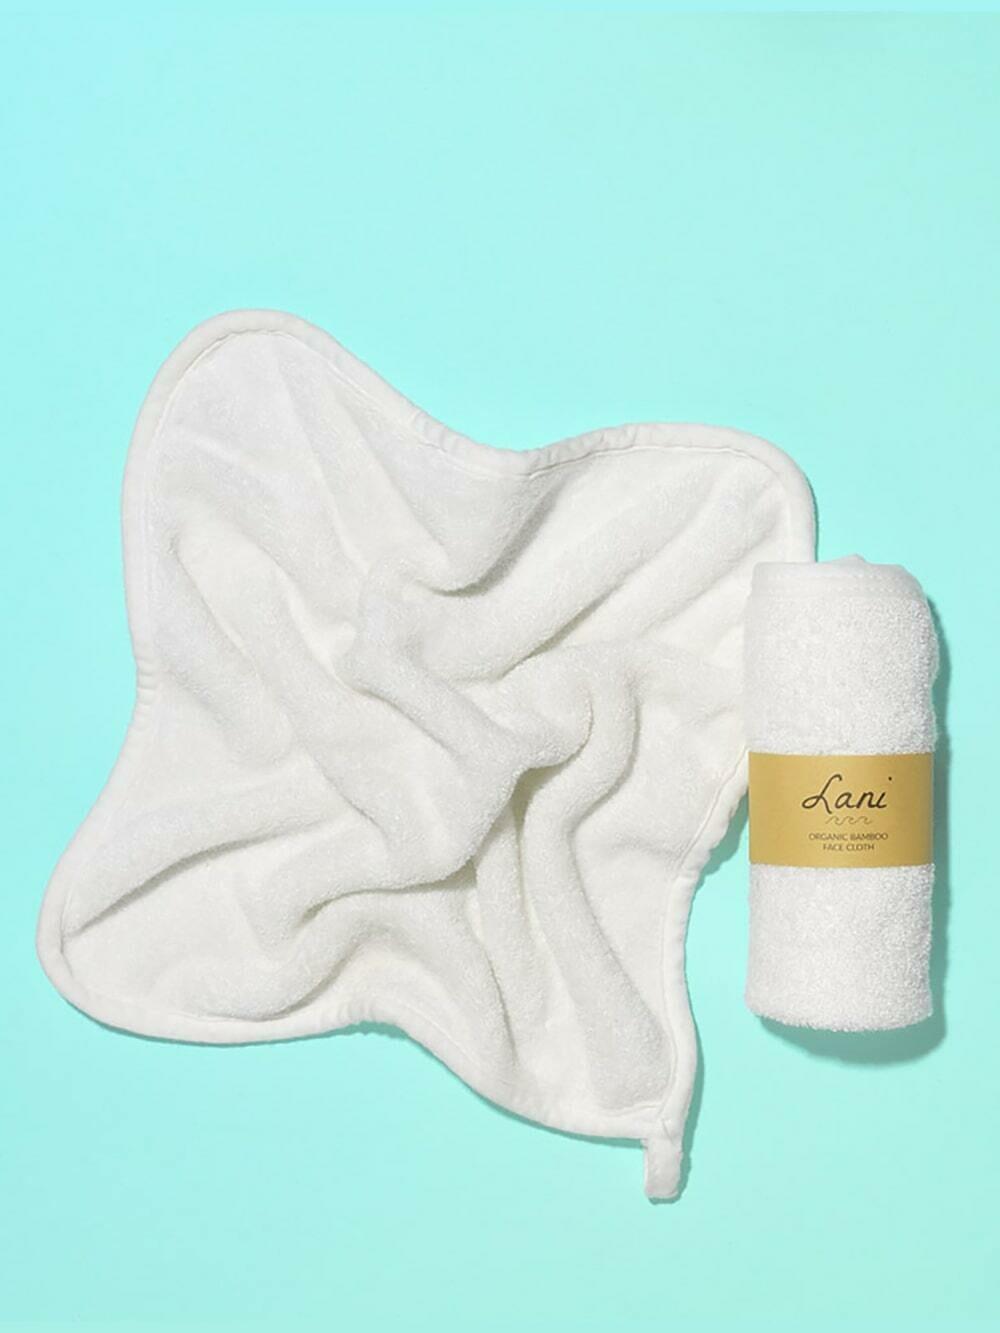 Lani Organic Bamboo Face Cloth, 25cm x 25cm